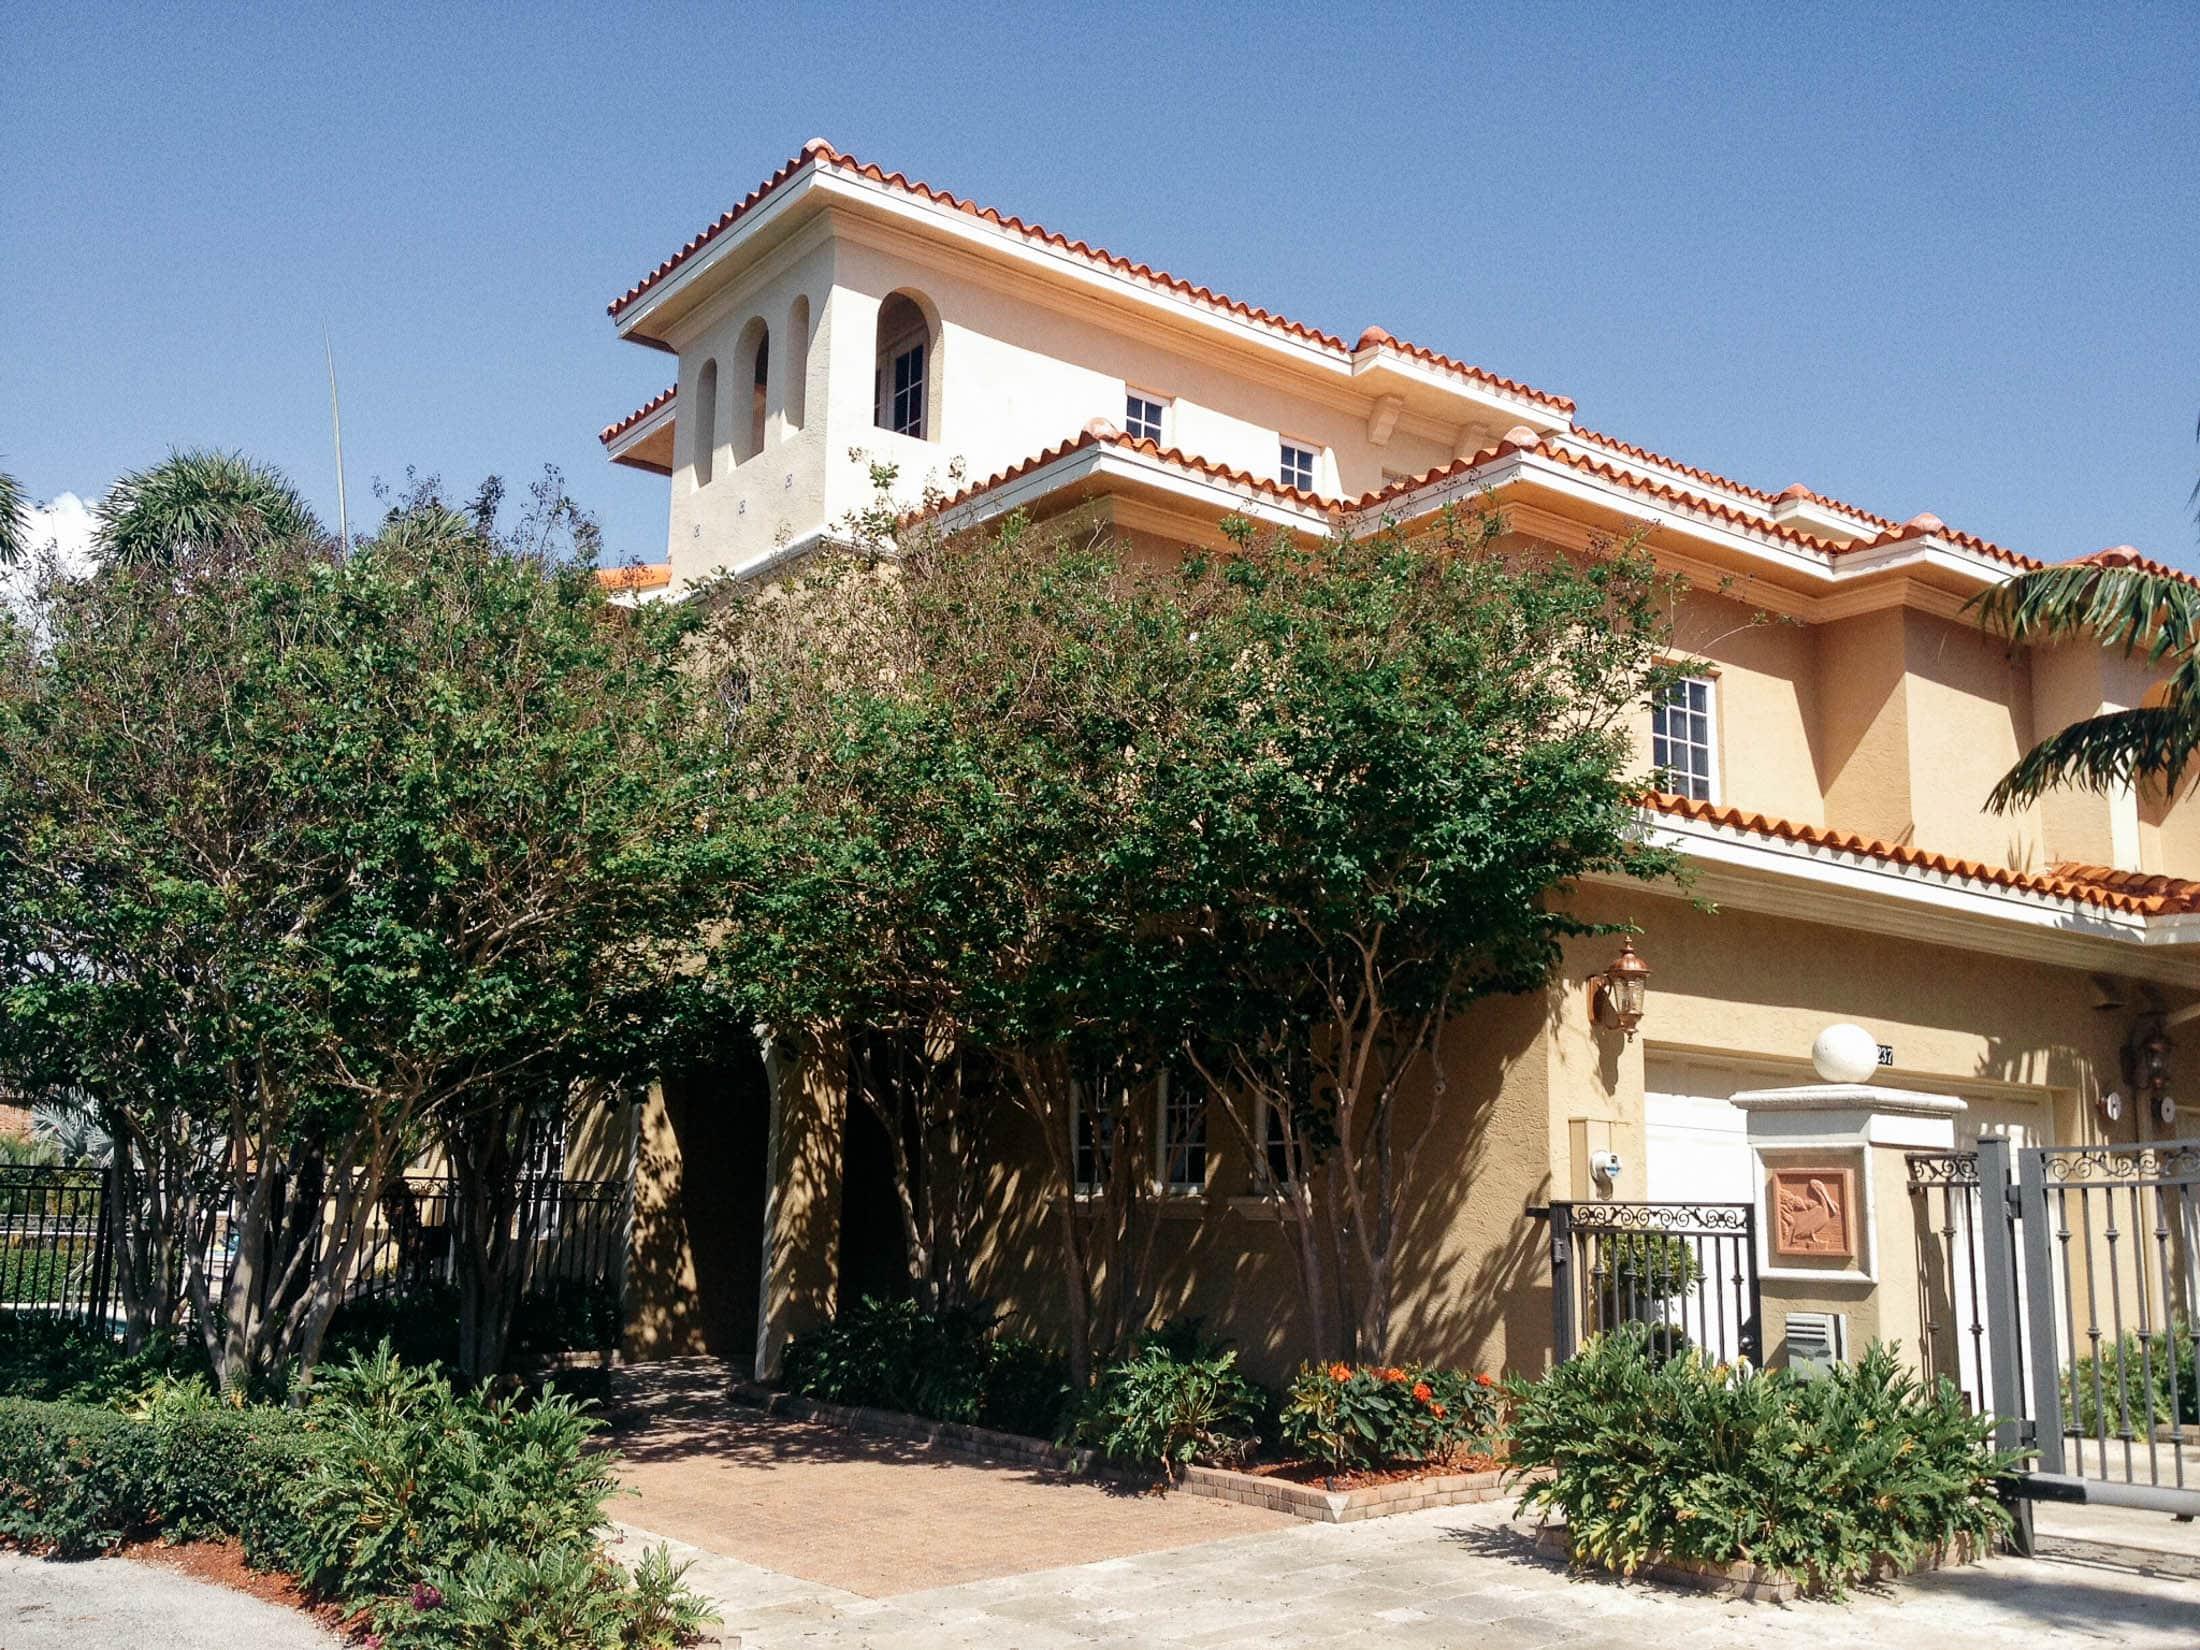 Fort Lauderdale Bachelorette House Rental